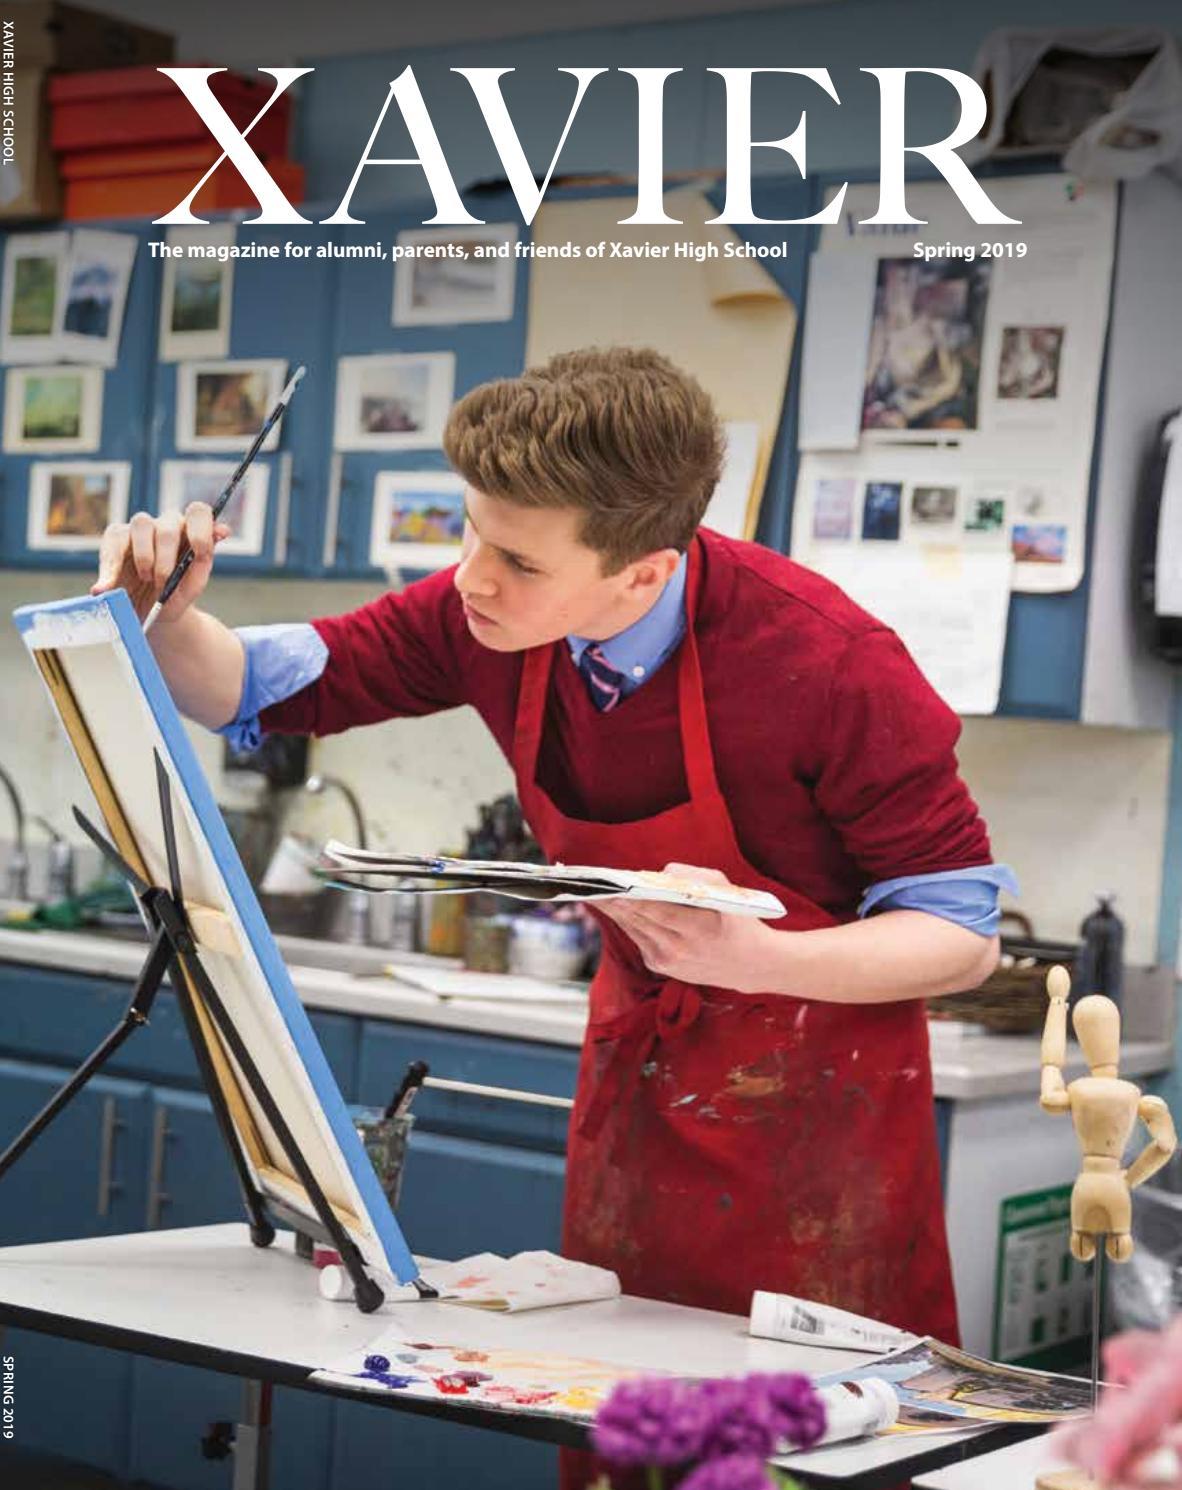 Xavier Magazine Spring 2019 By Xavier High School Issuu